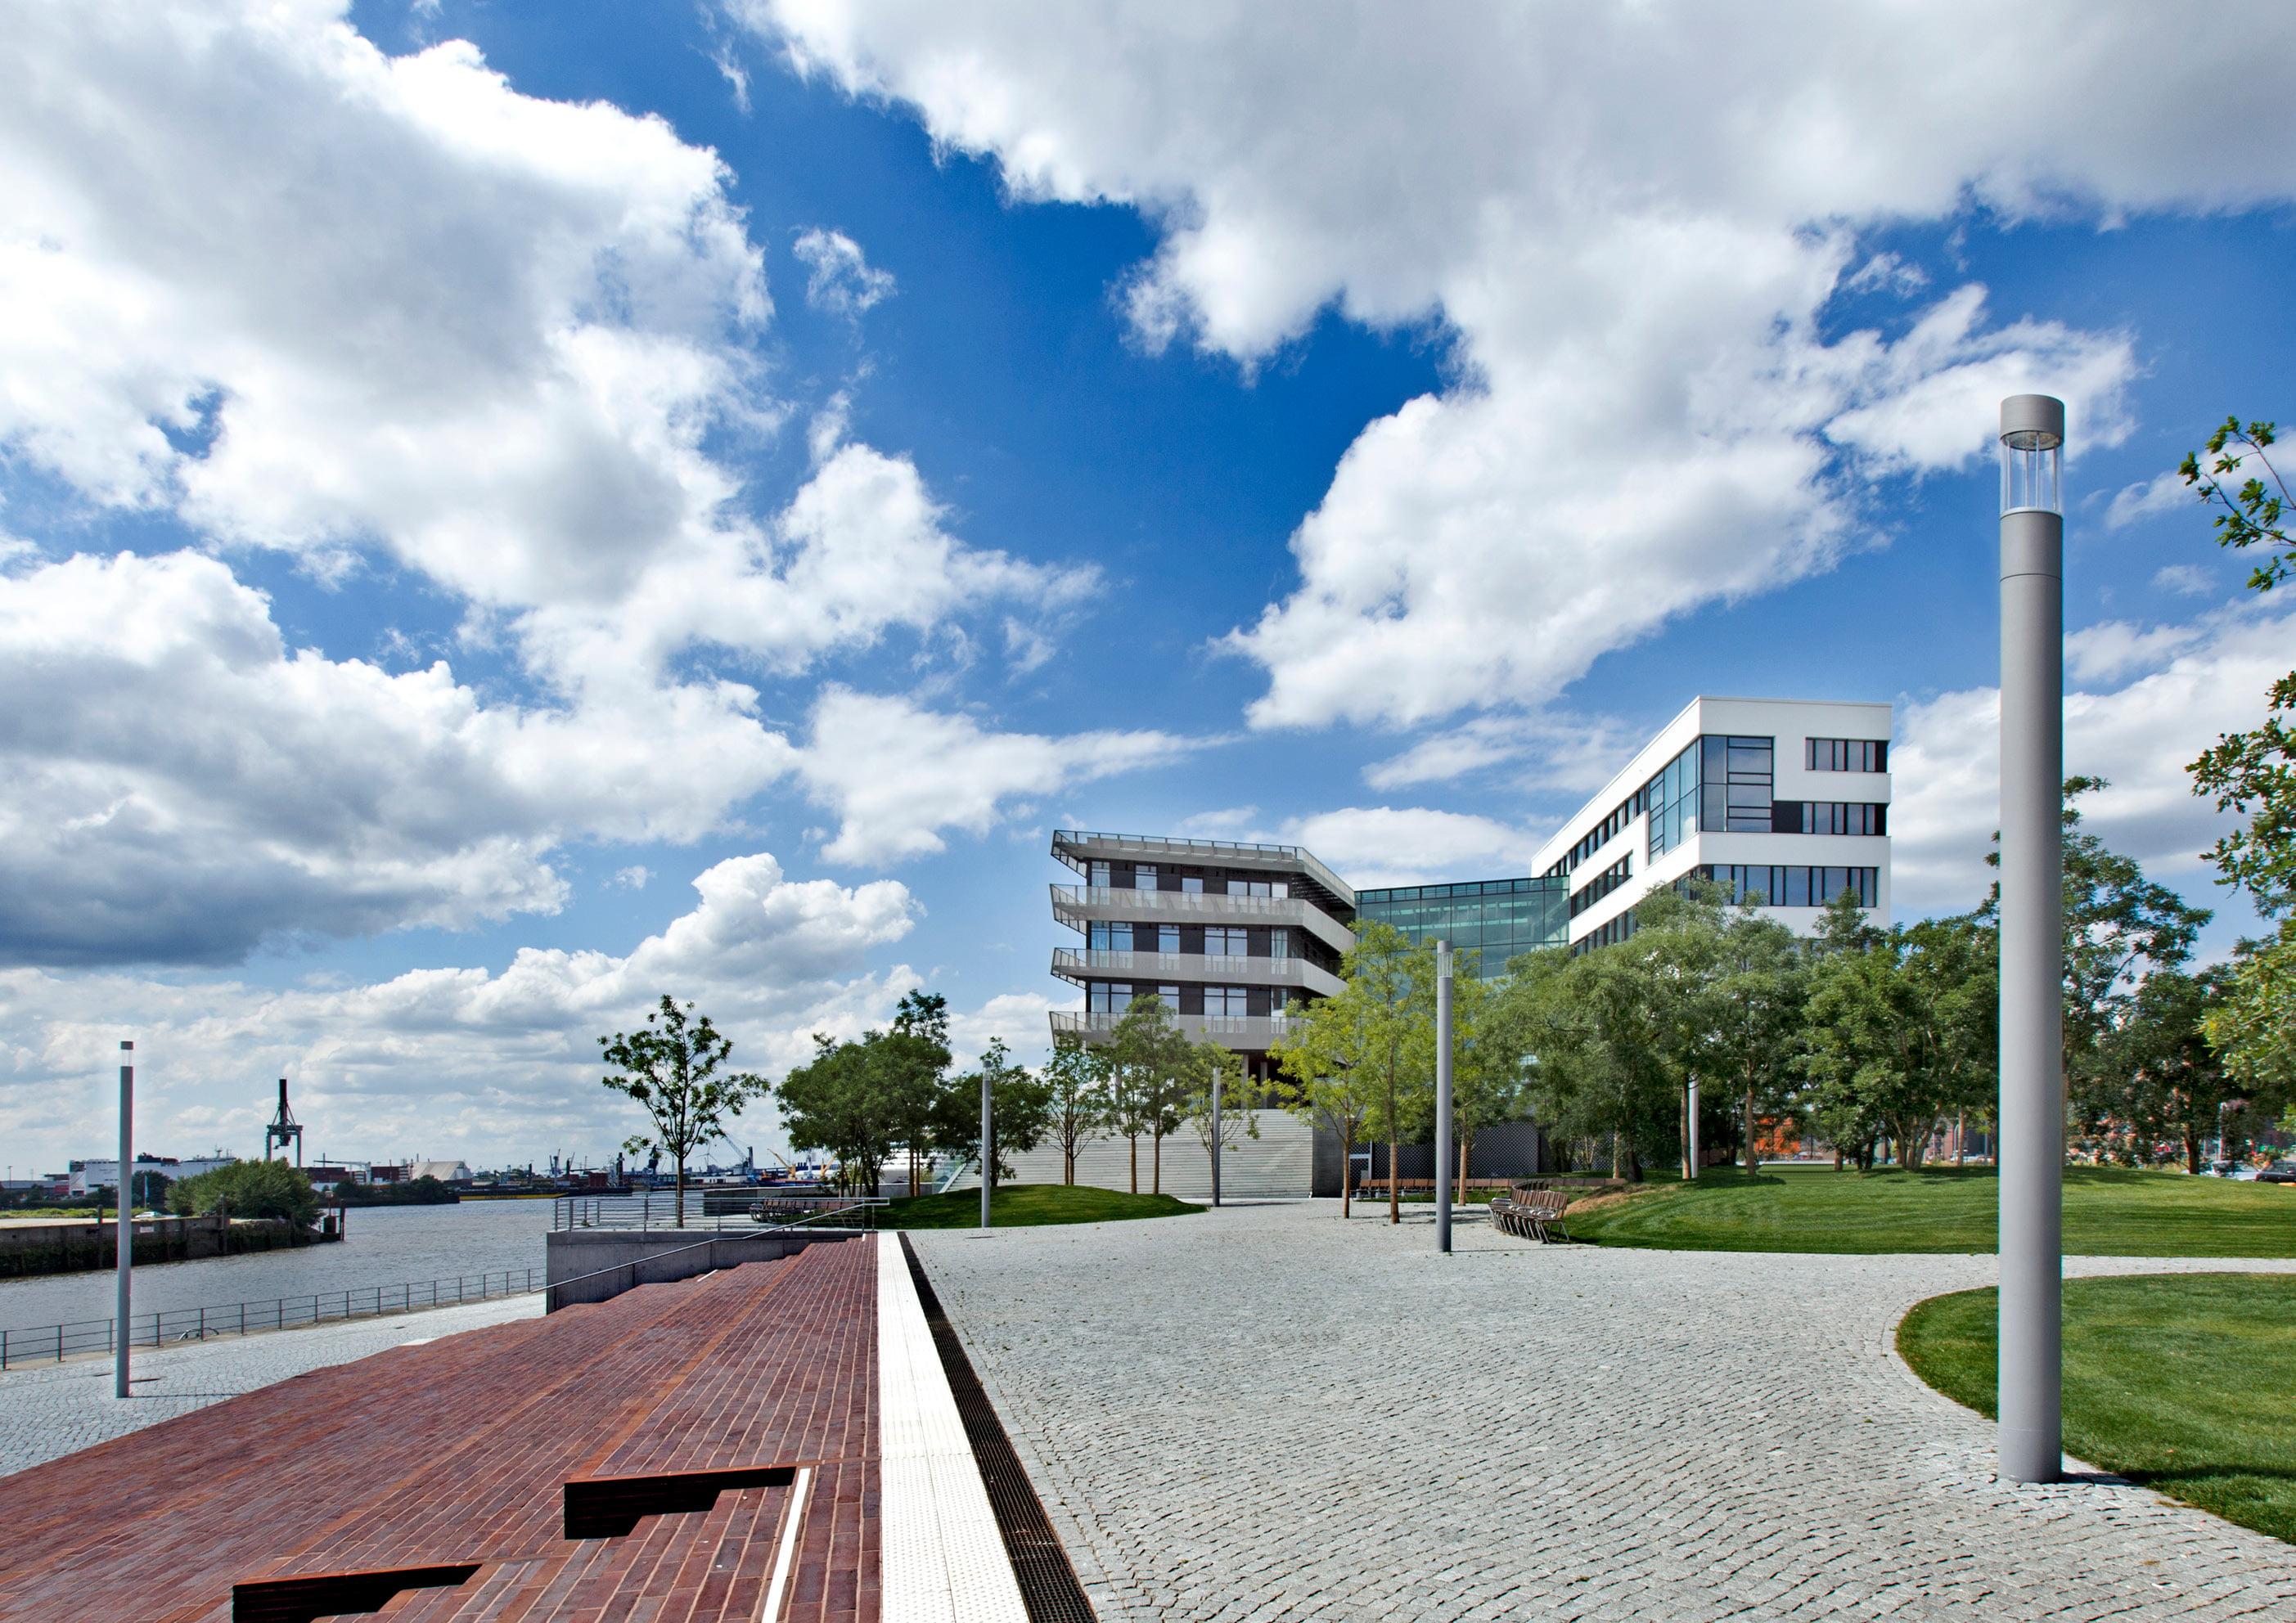 Hess_CITY_ELEMENTS_HafenCity_Hamburg_GER